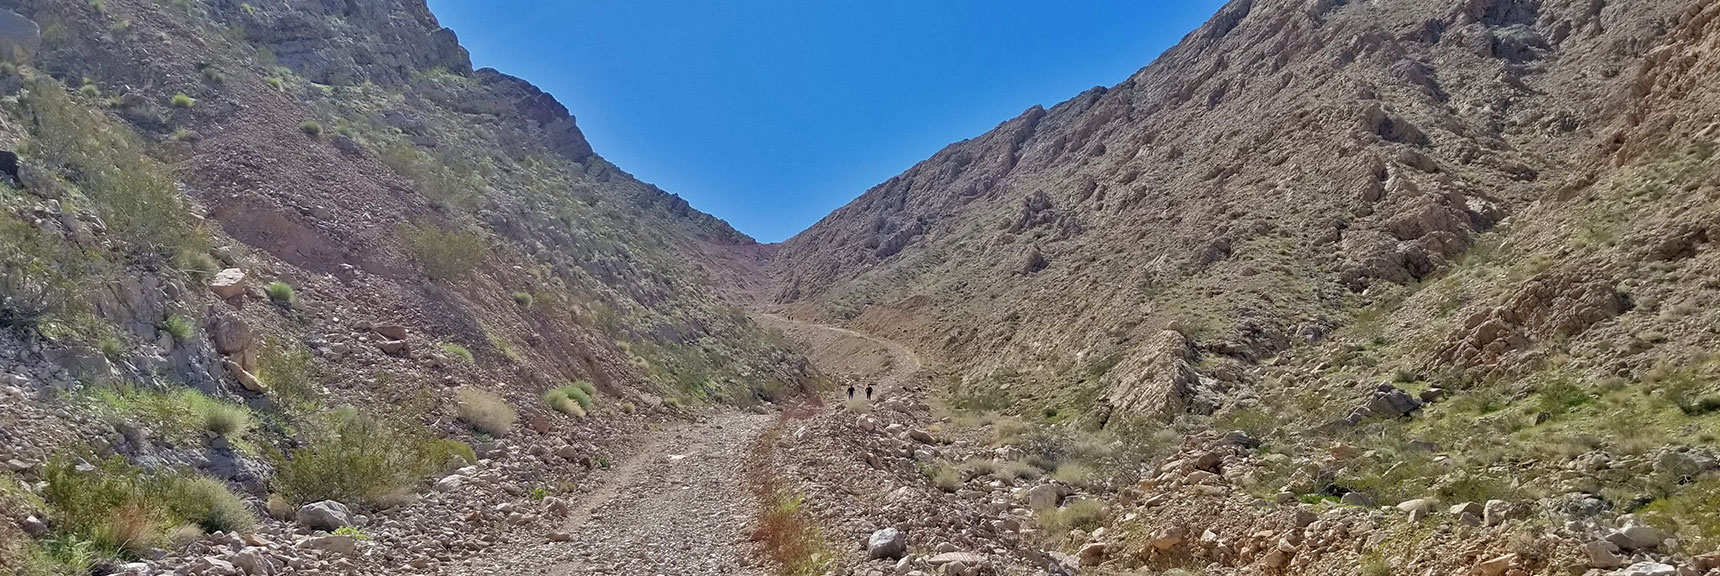 Road Ascending Frenchman Mountain, Nevada